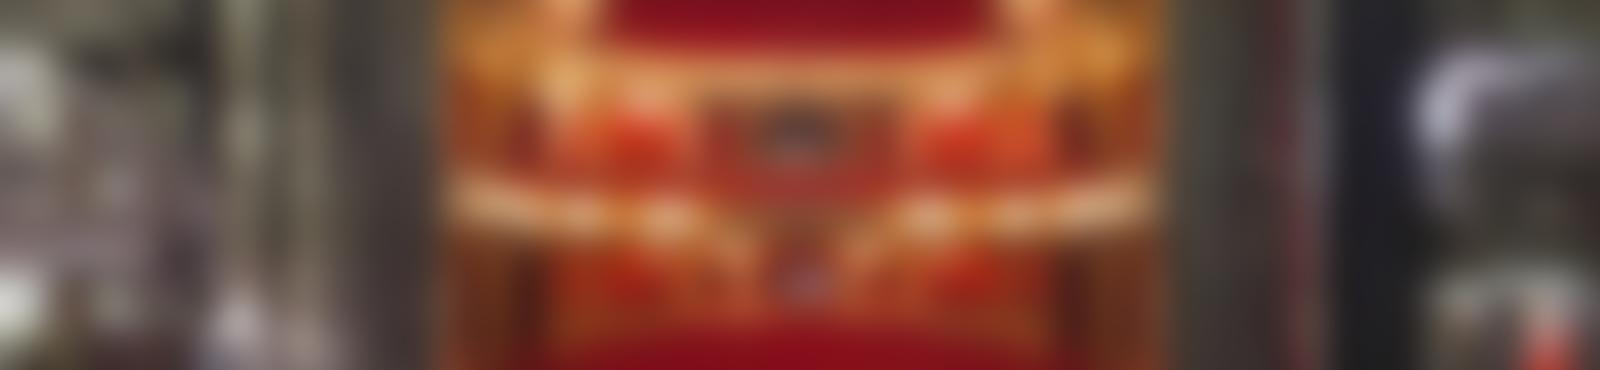 Blurred 18d47b2e 15ba 48d4 a4d7 25a8861b98dc